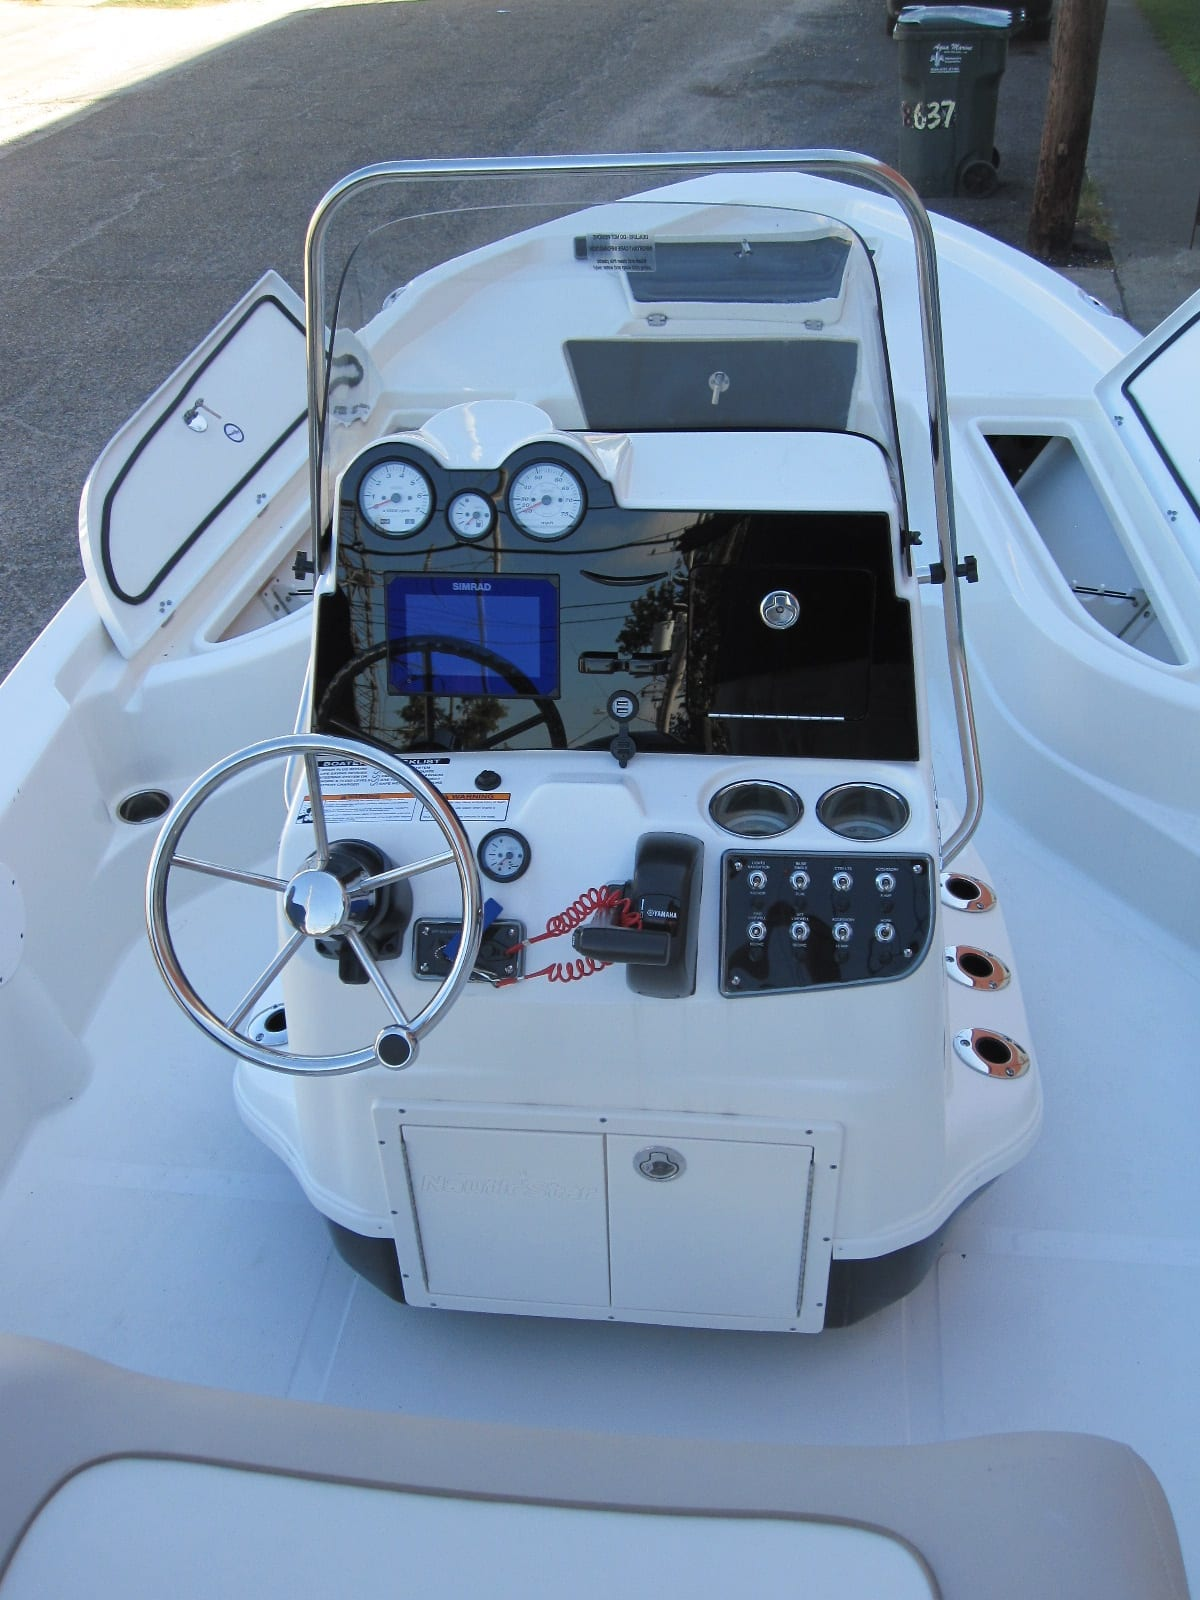 NauticStar 215 XTS F150